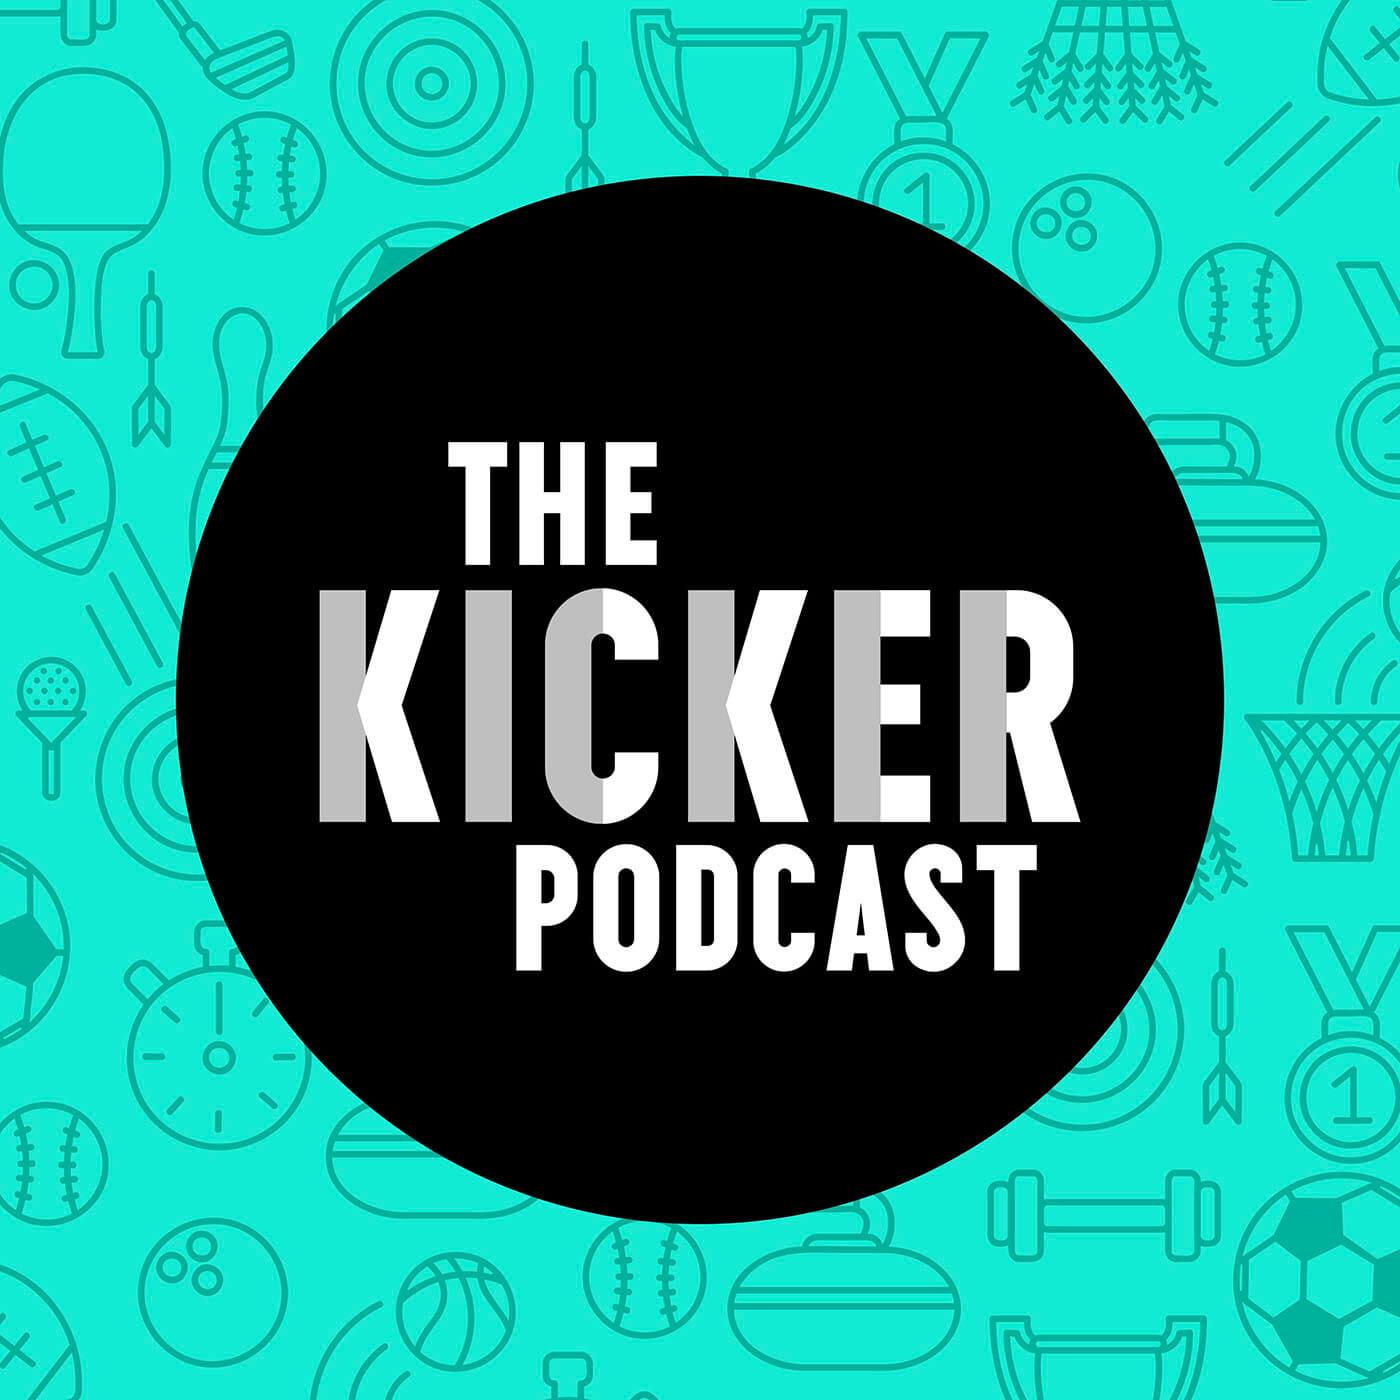 The Kicker Podcast: A Sports - Comedy Show logo